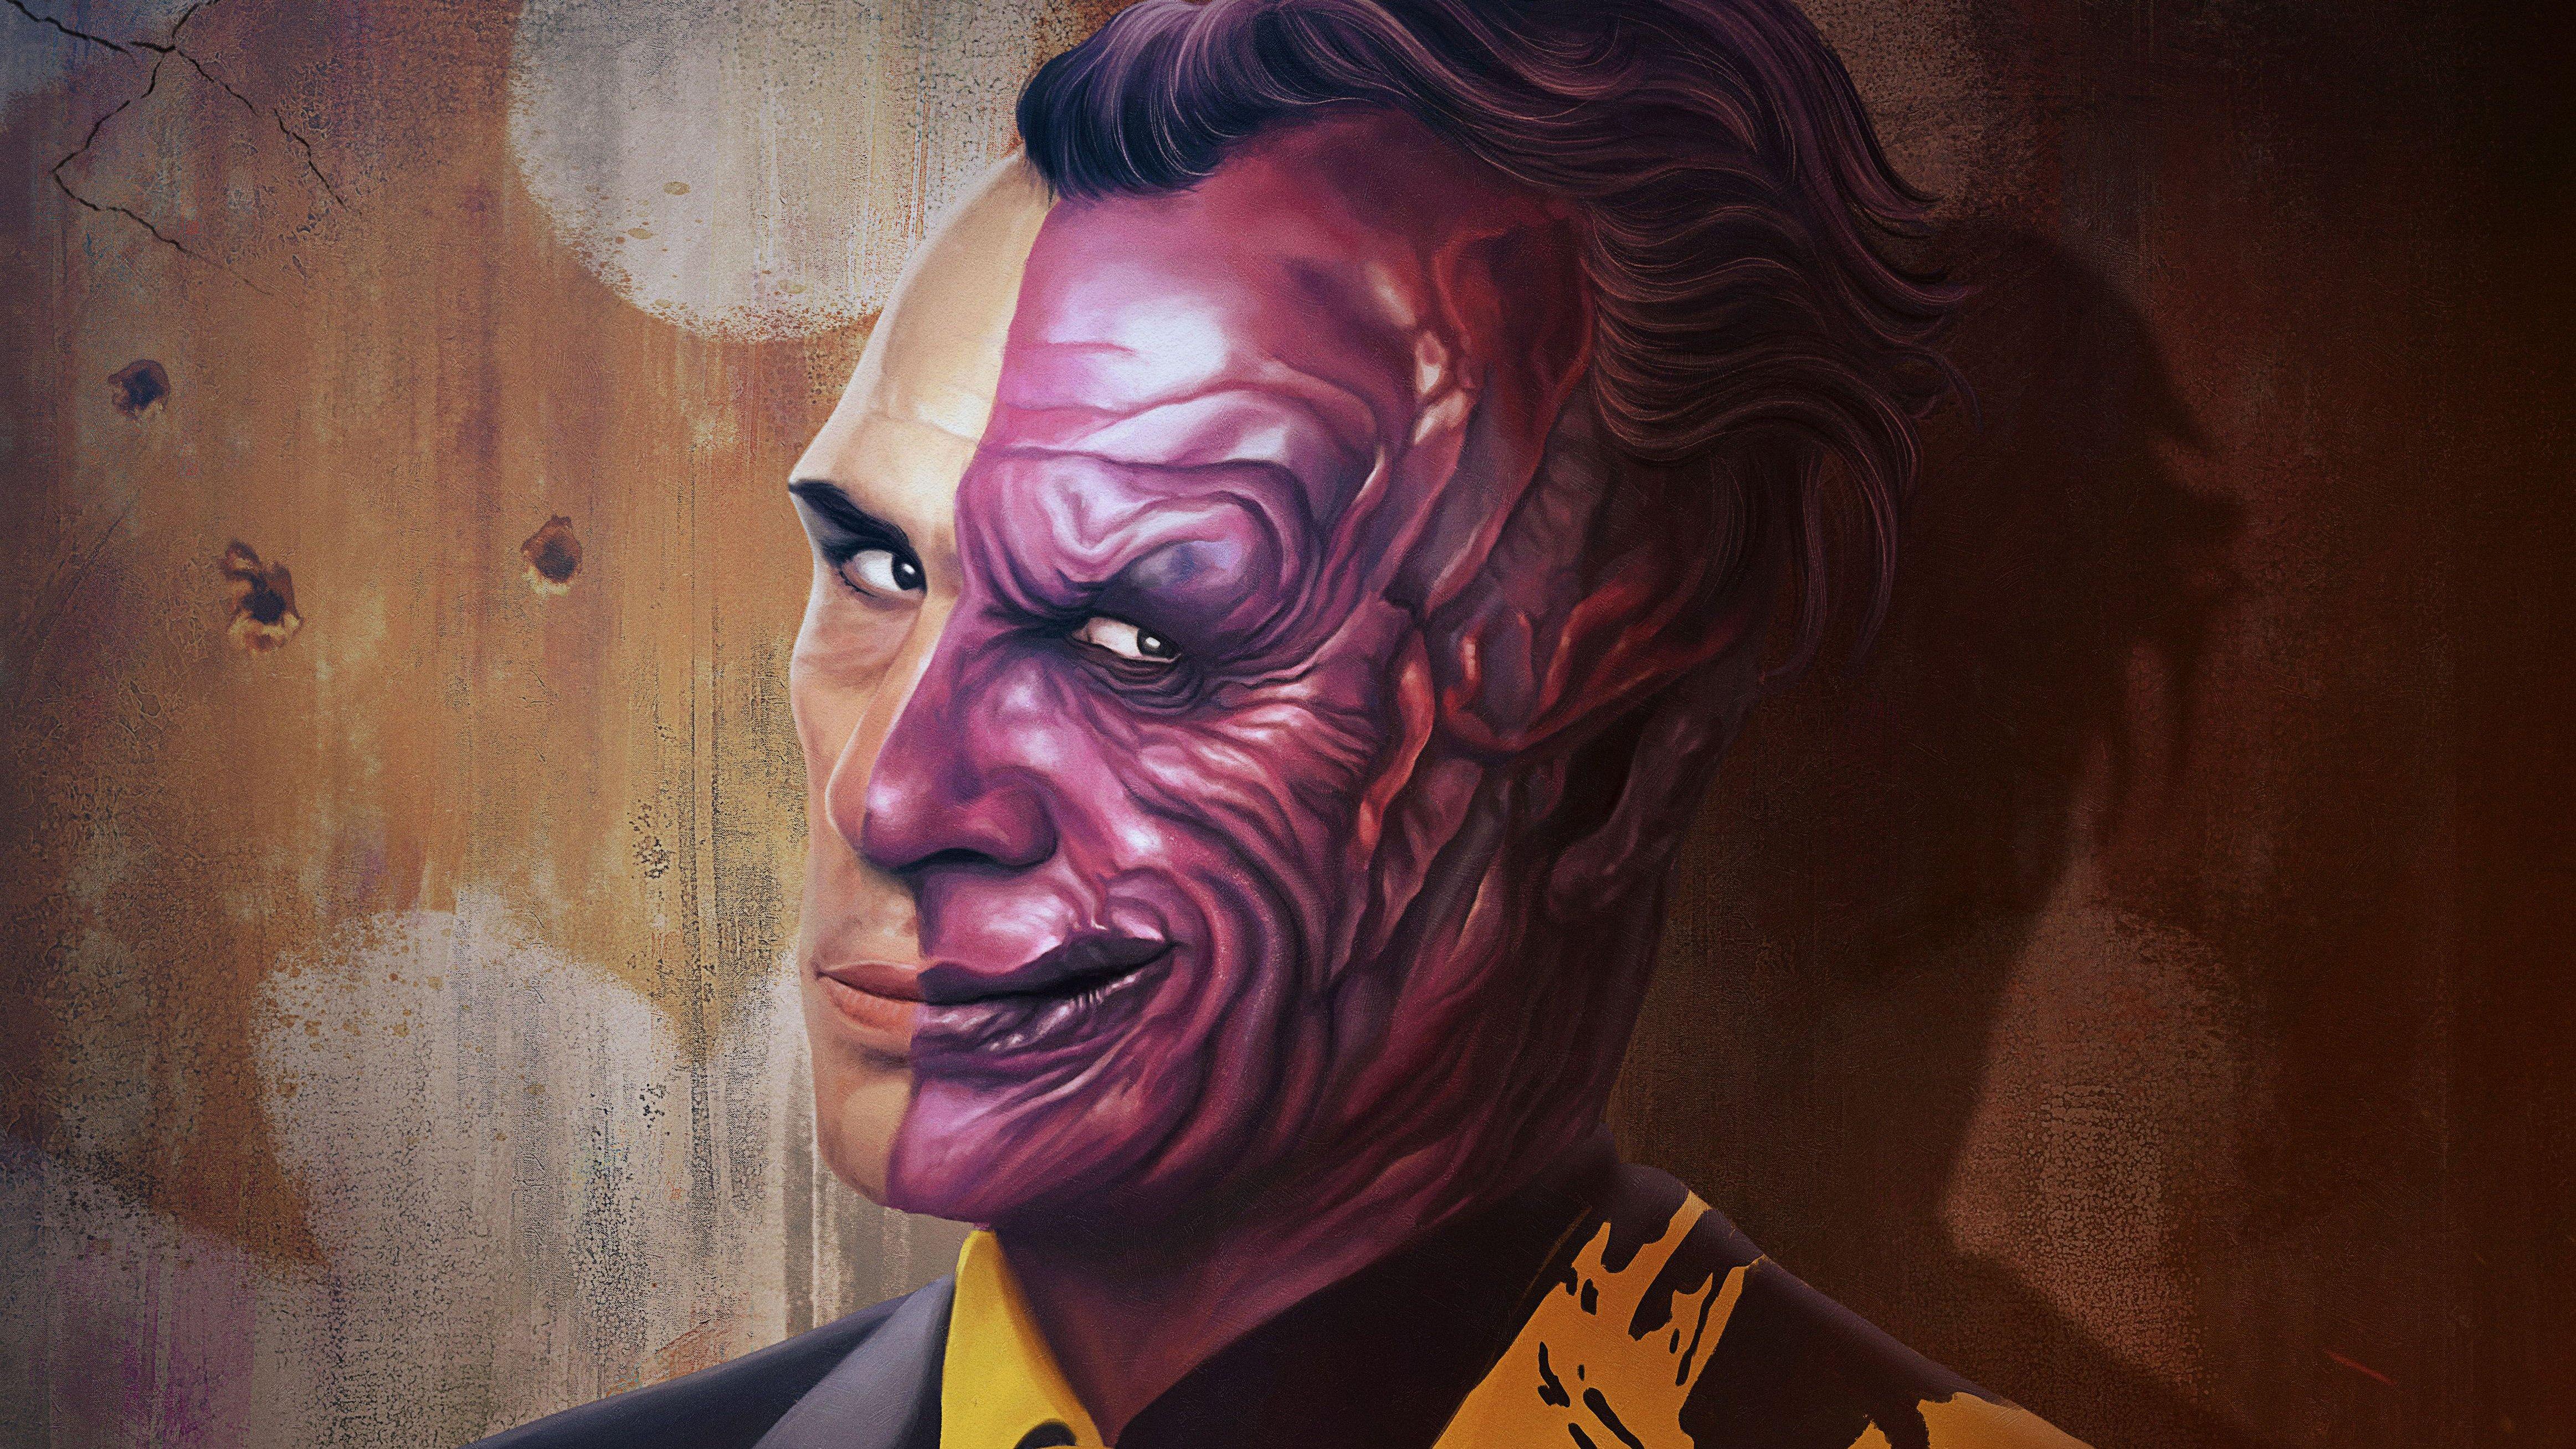 Wallpaper Supervillain Two Face